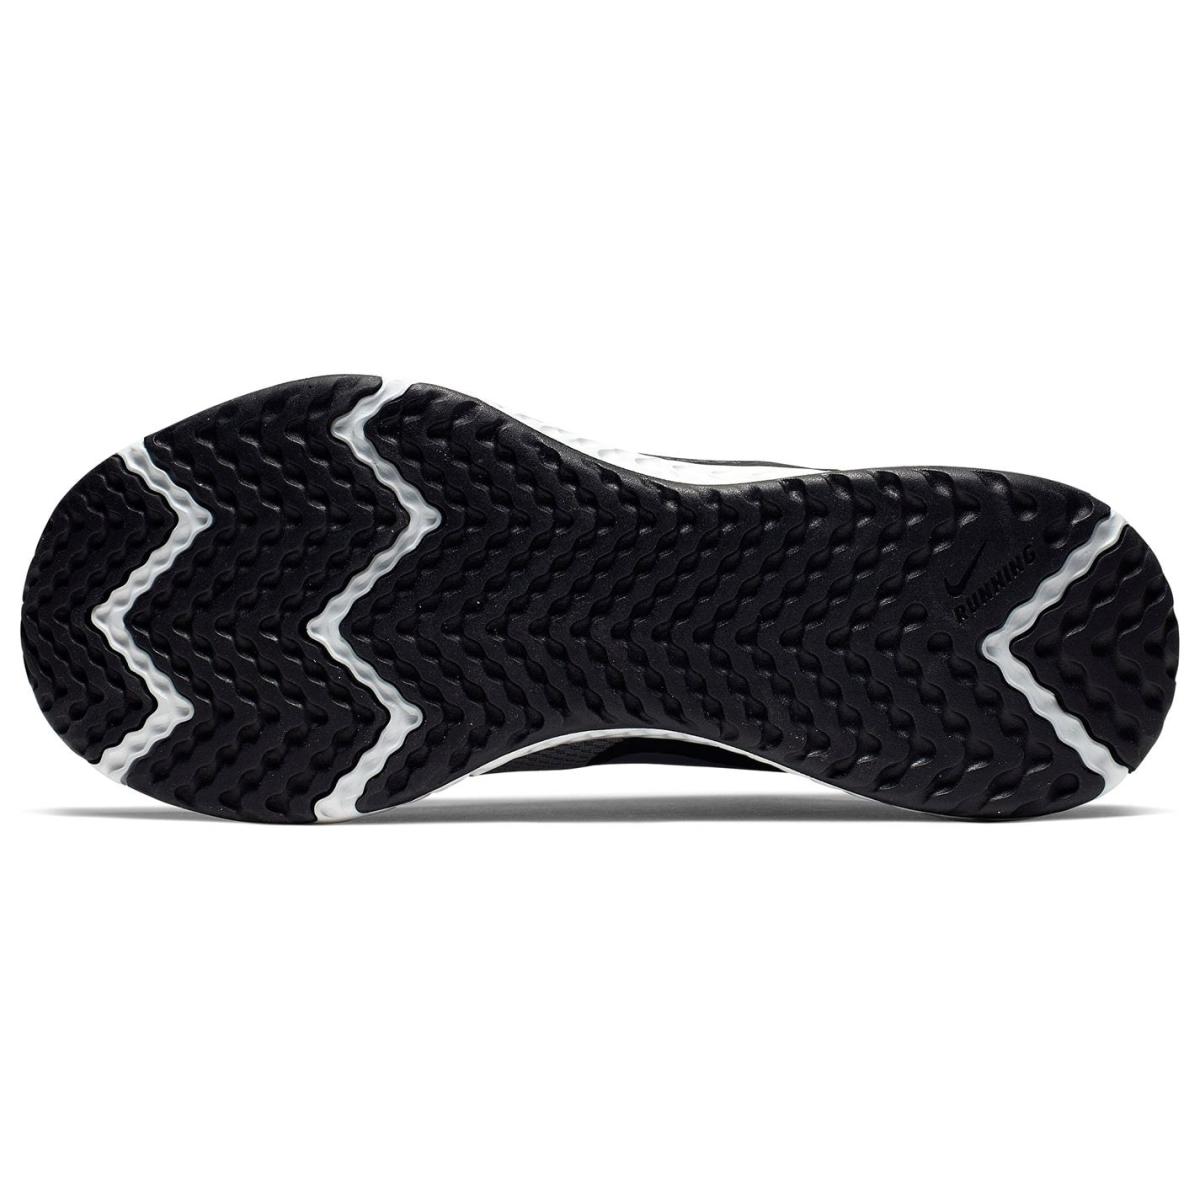 Nike-Revolution-Turnschuhe-Damen-Sneaker-Sportschuhe-Laufschuhe-1160 Indexbild 15